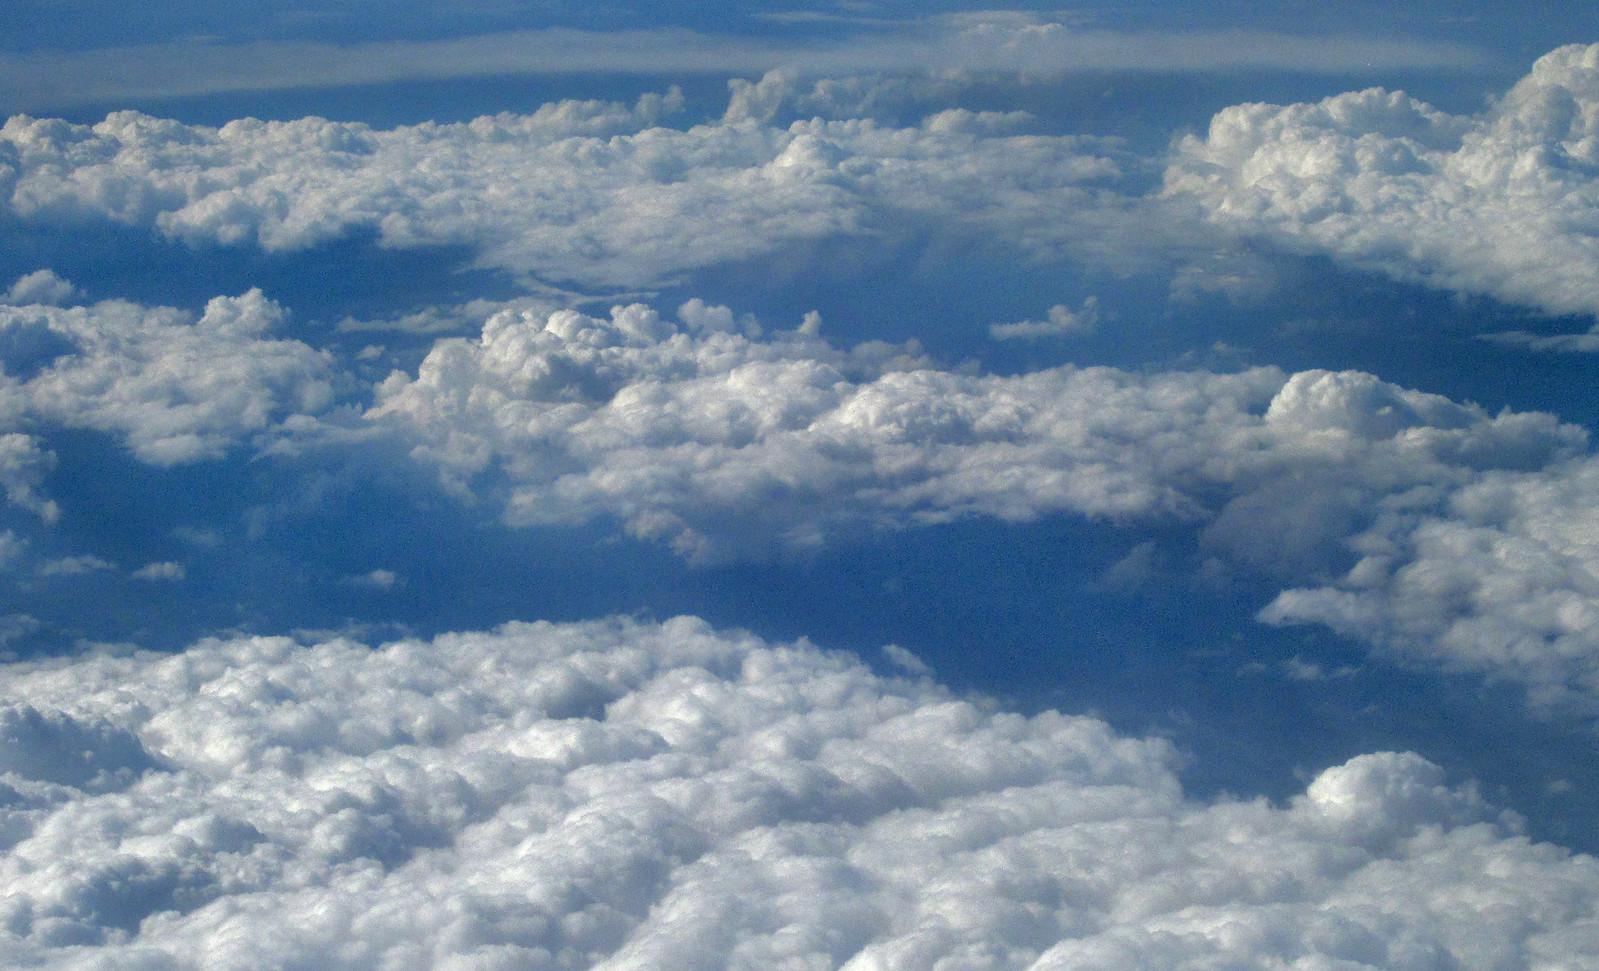 aérea cielo 05